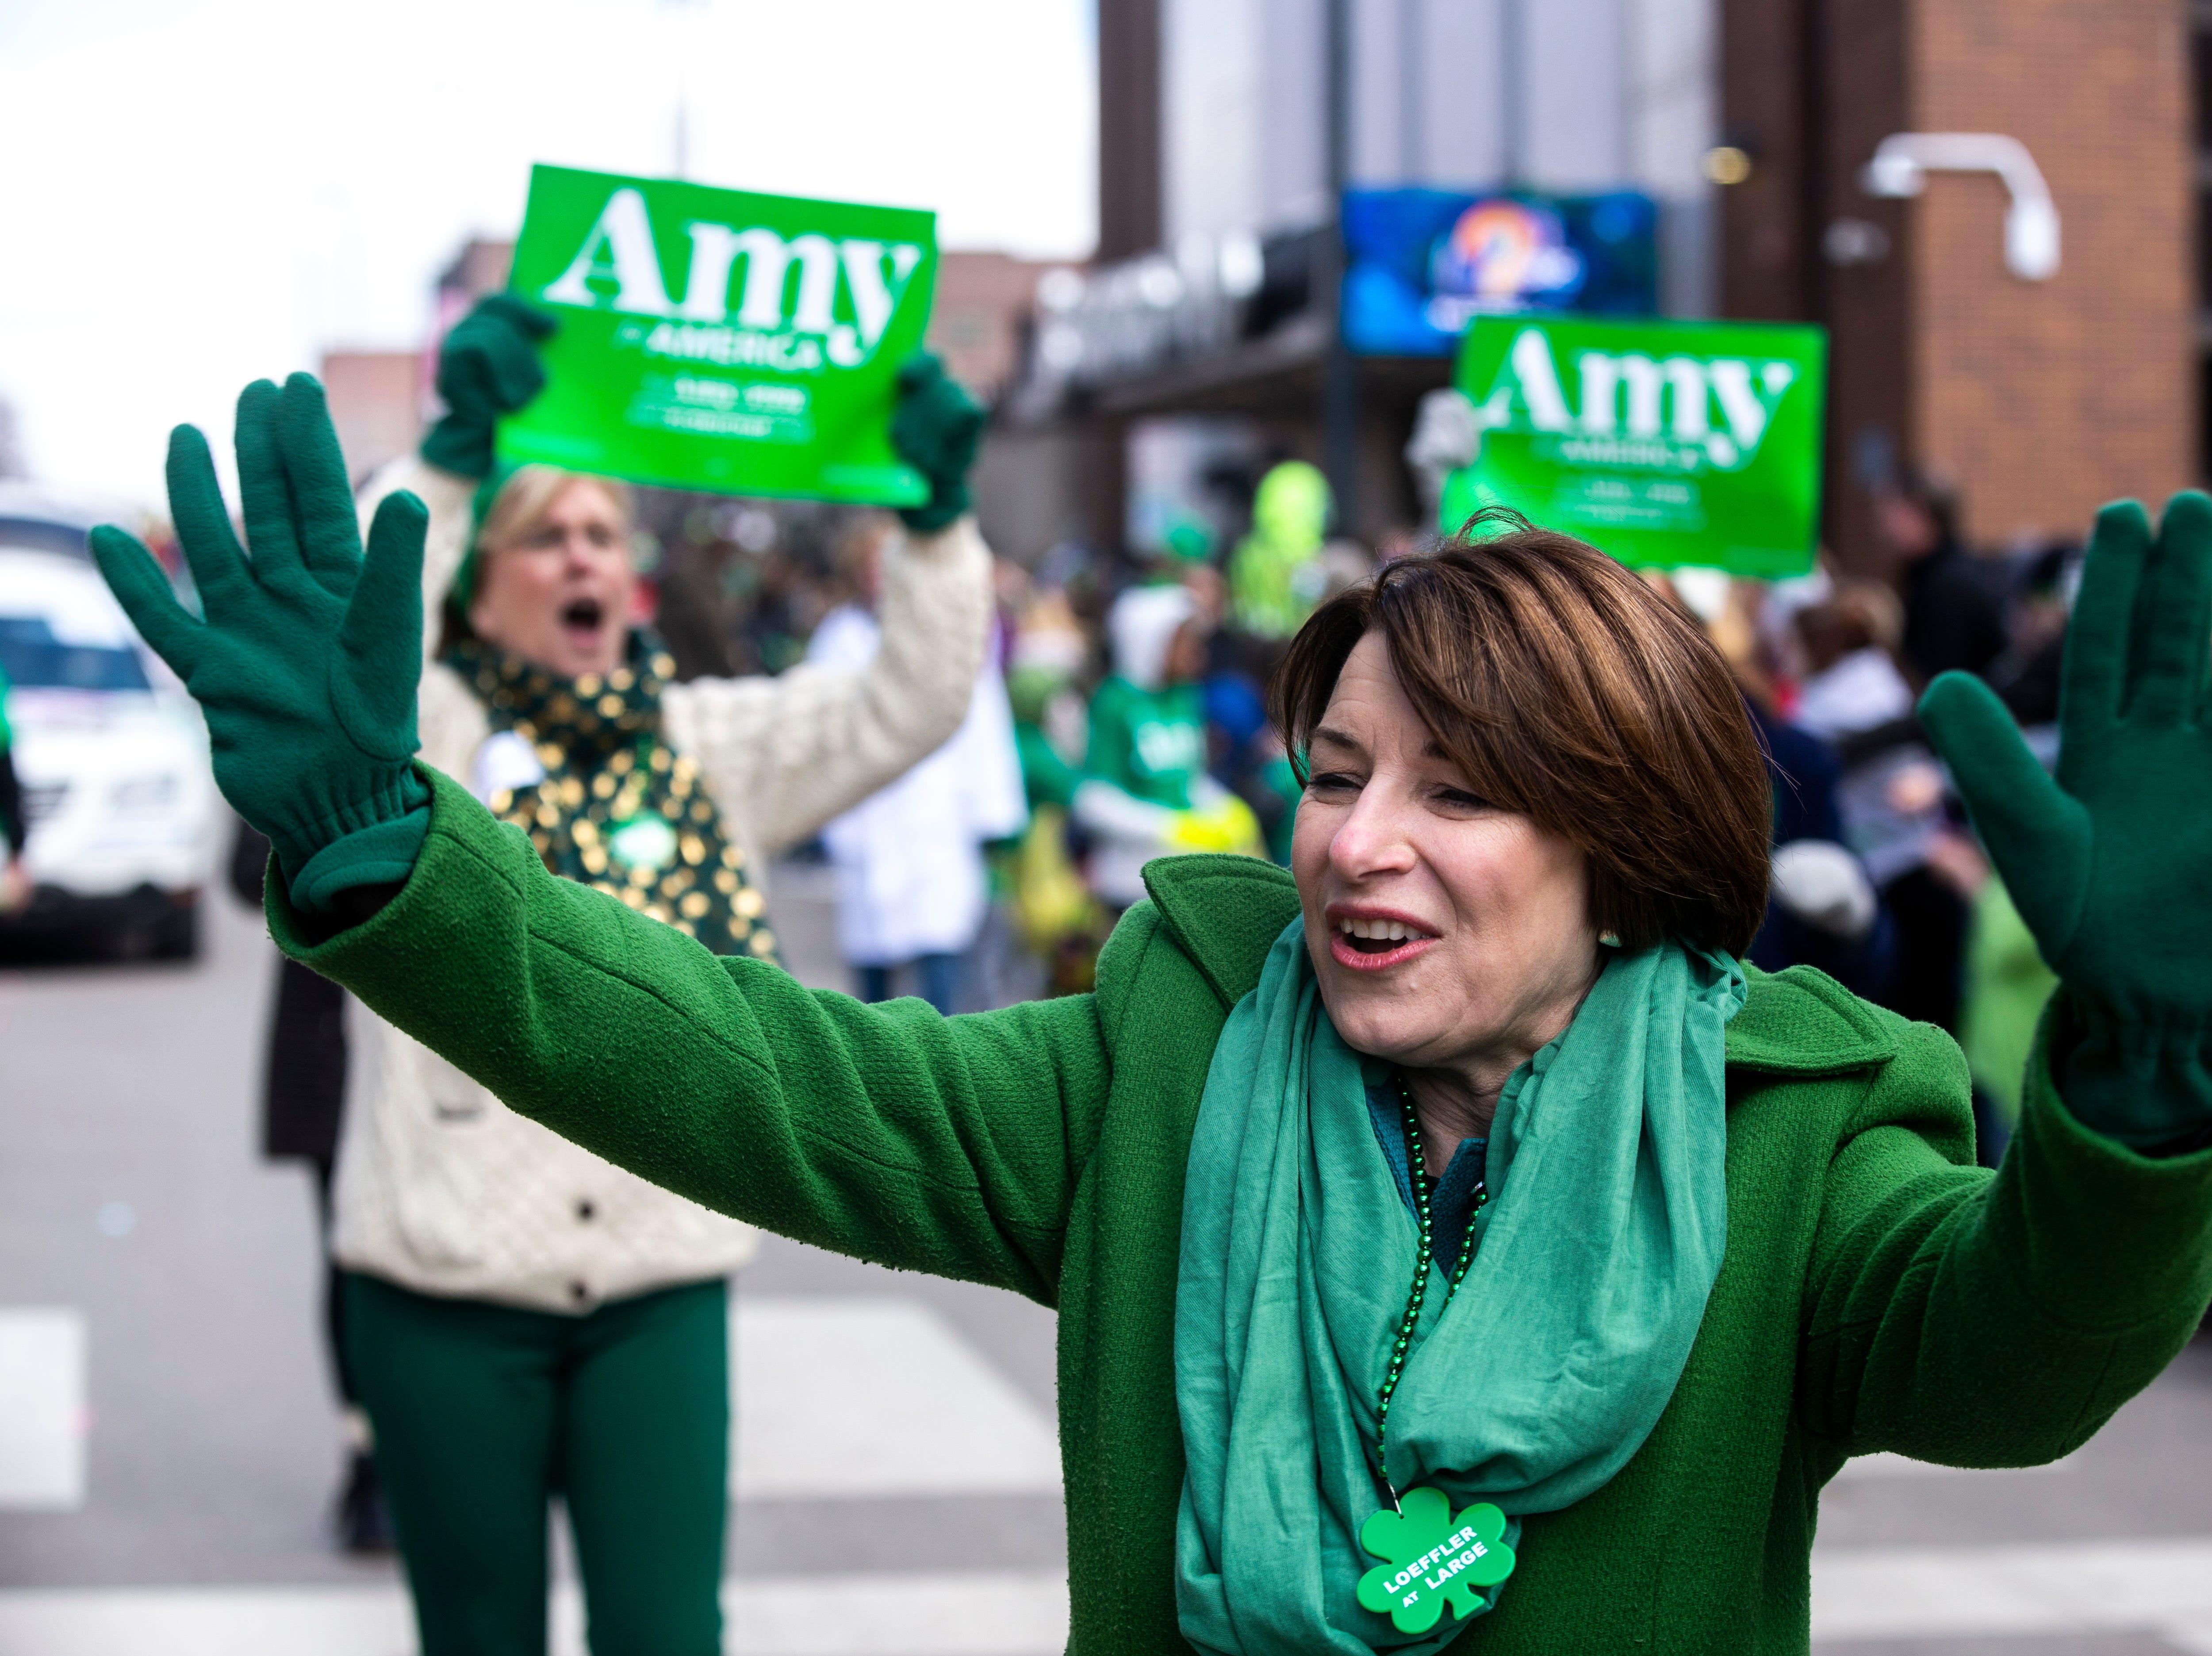 U.S. Sen. Amy Klobuchar, D-Minn., waves to people while walking in the Saint Patrick's Day Parade Society (SaPaDaPaSo) parade on Sunday, March 17, 2019, in downtown Cedar Rapids, Iowa.